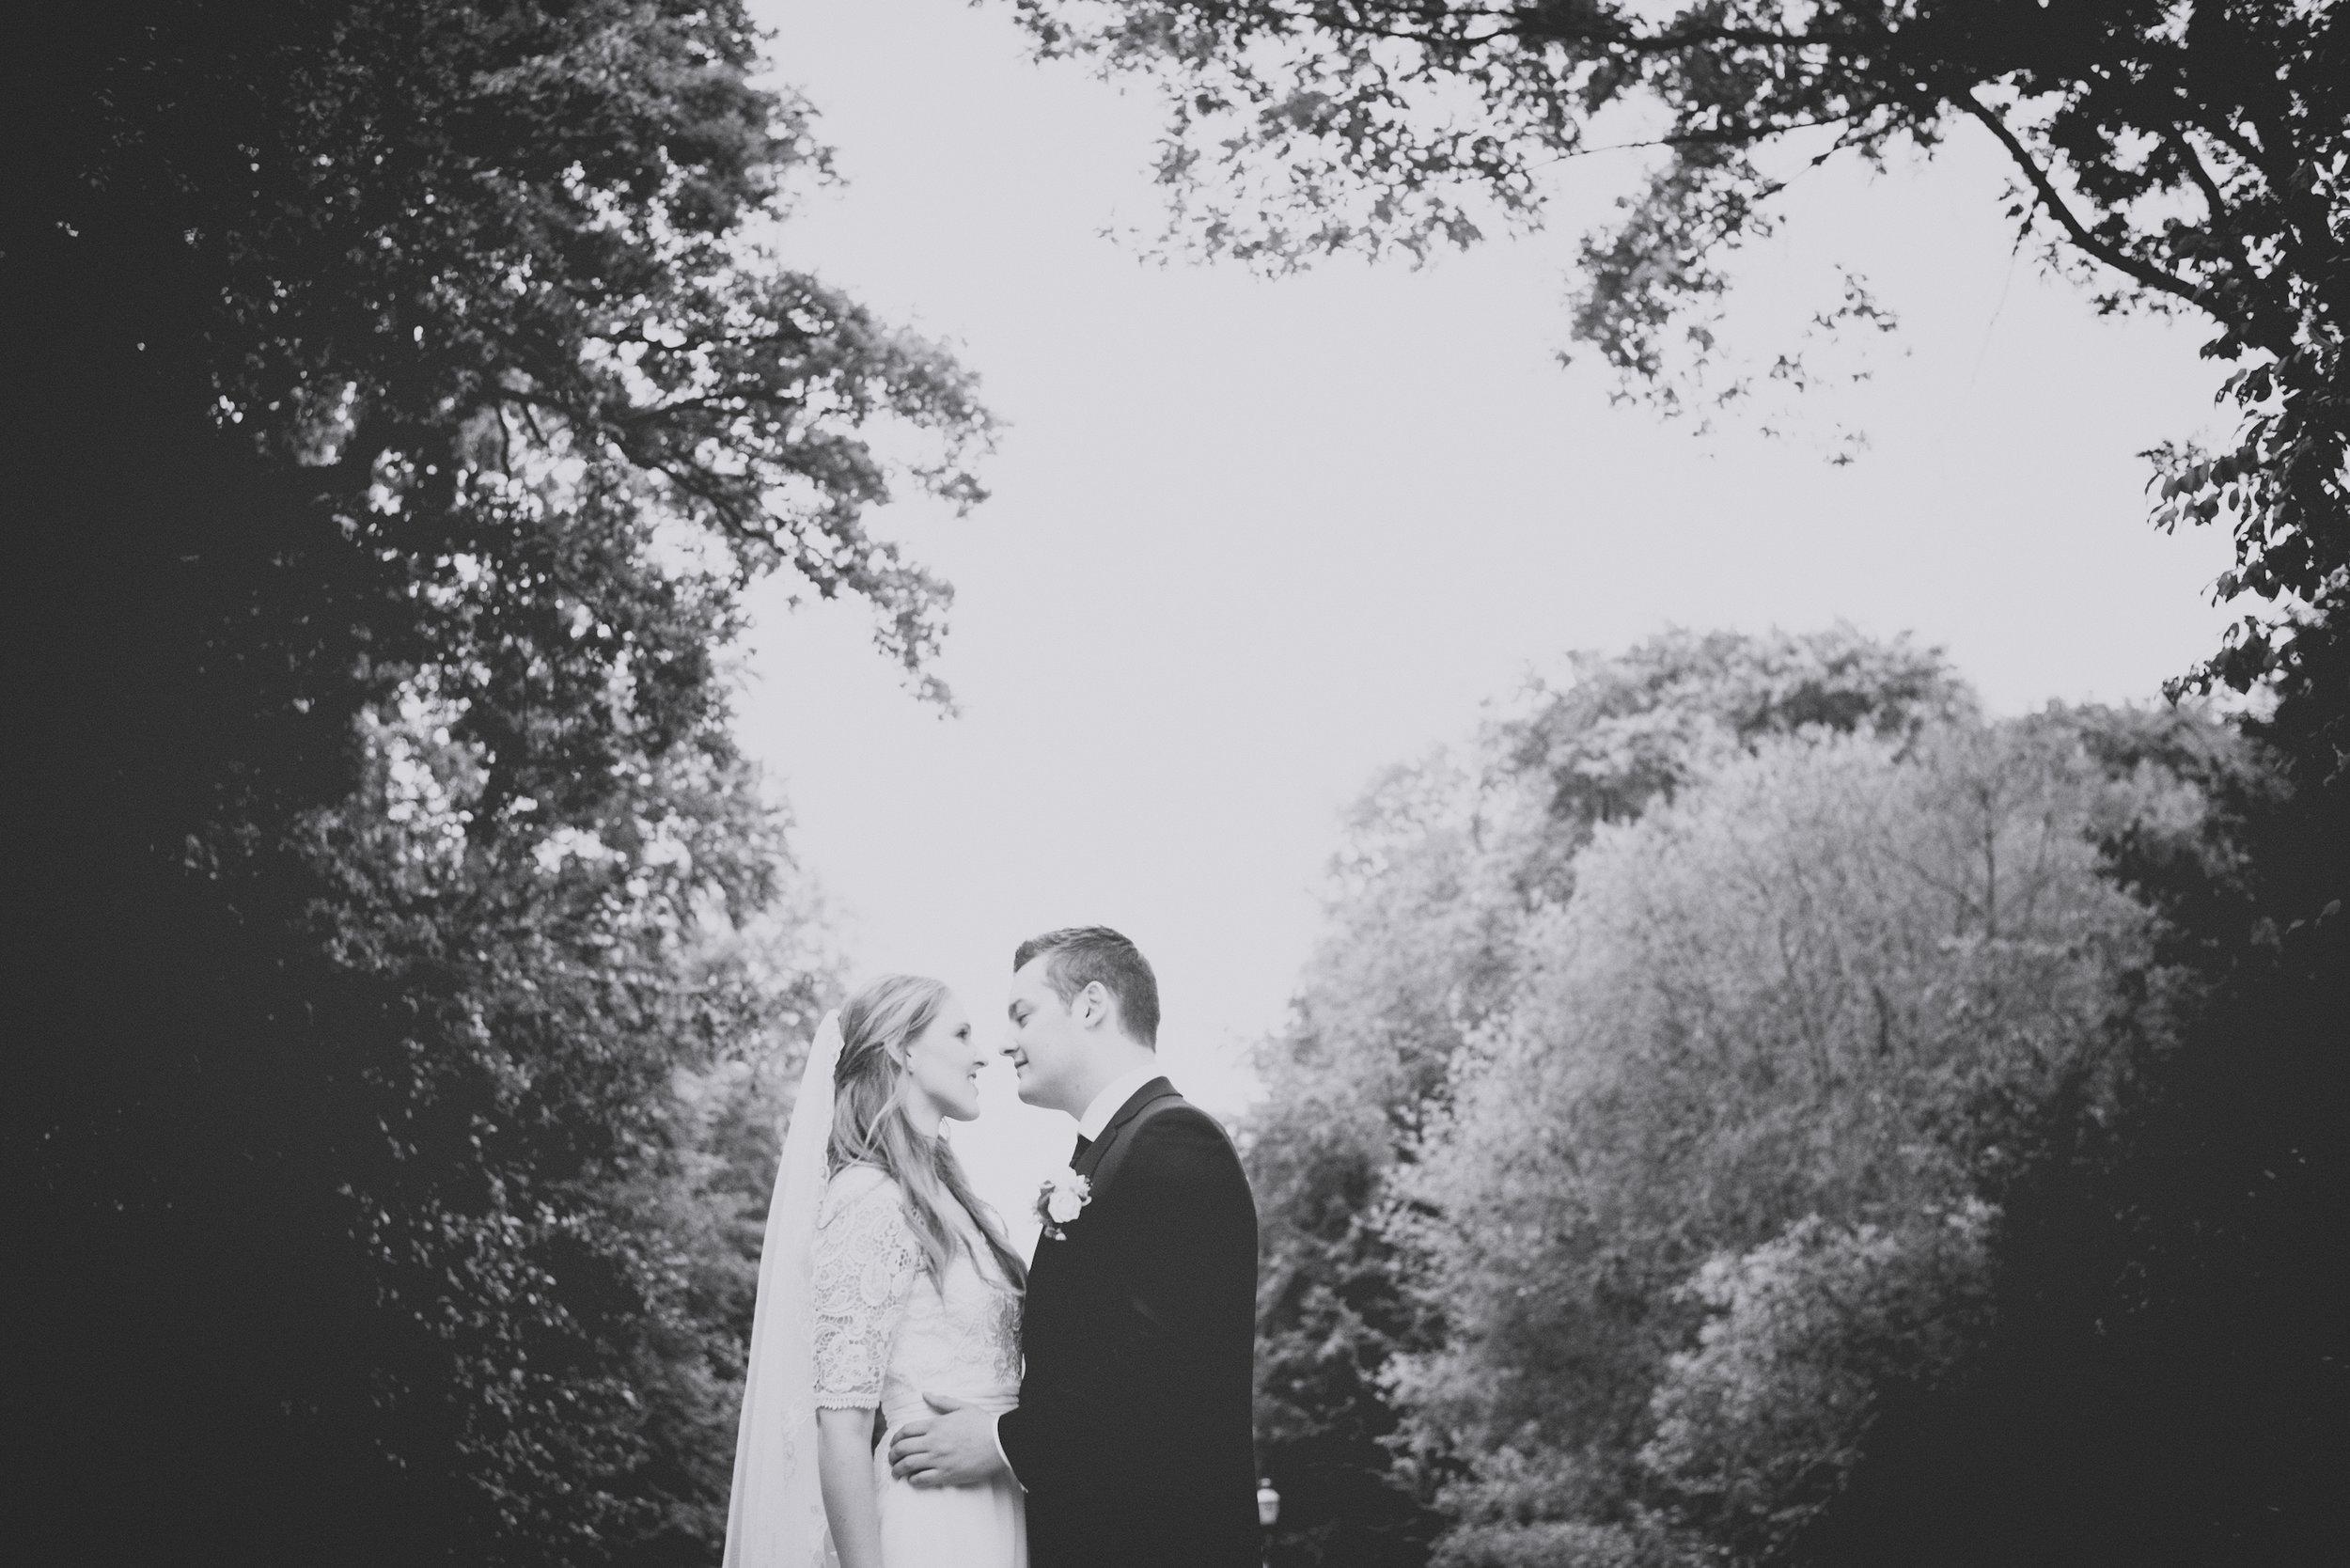 York Region Ontario Wedding Photographer - Bride + Groom-10.jpg